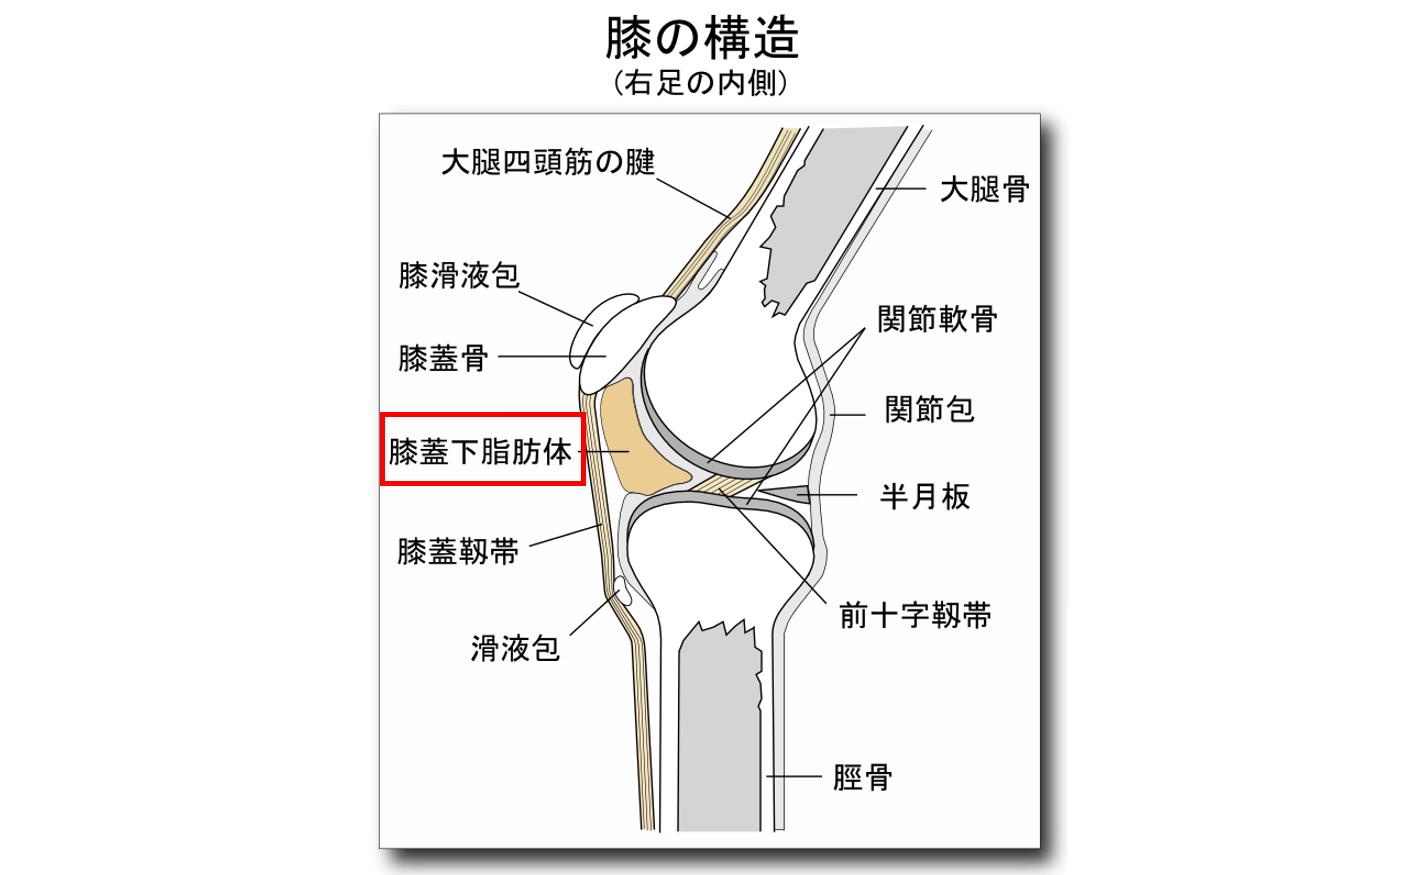 膝痛の原因箇所②:膝蓋下脂肪体